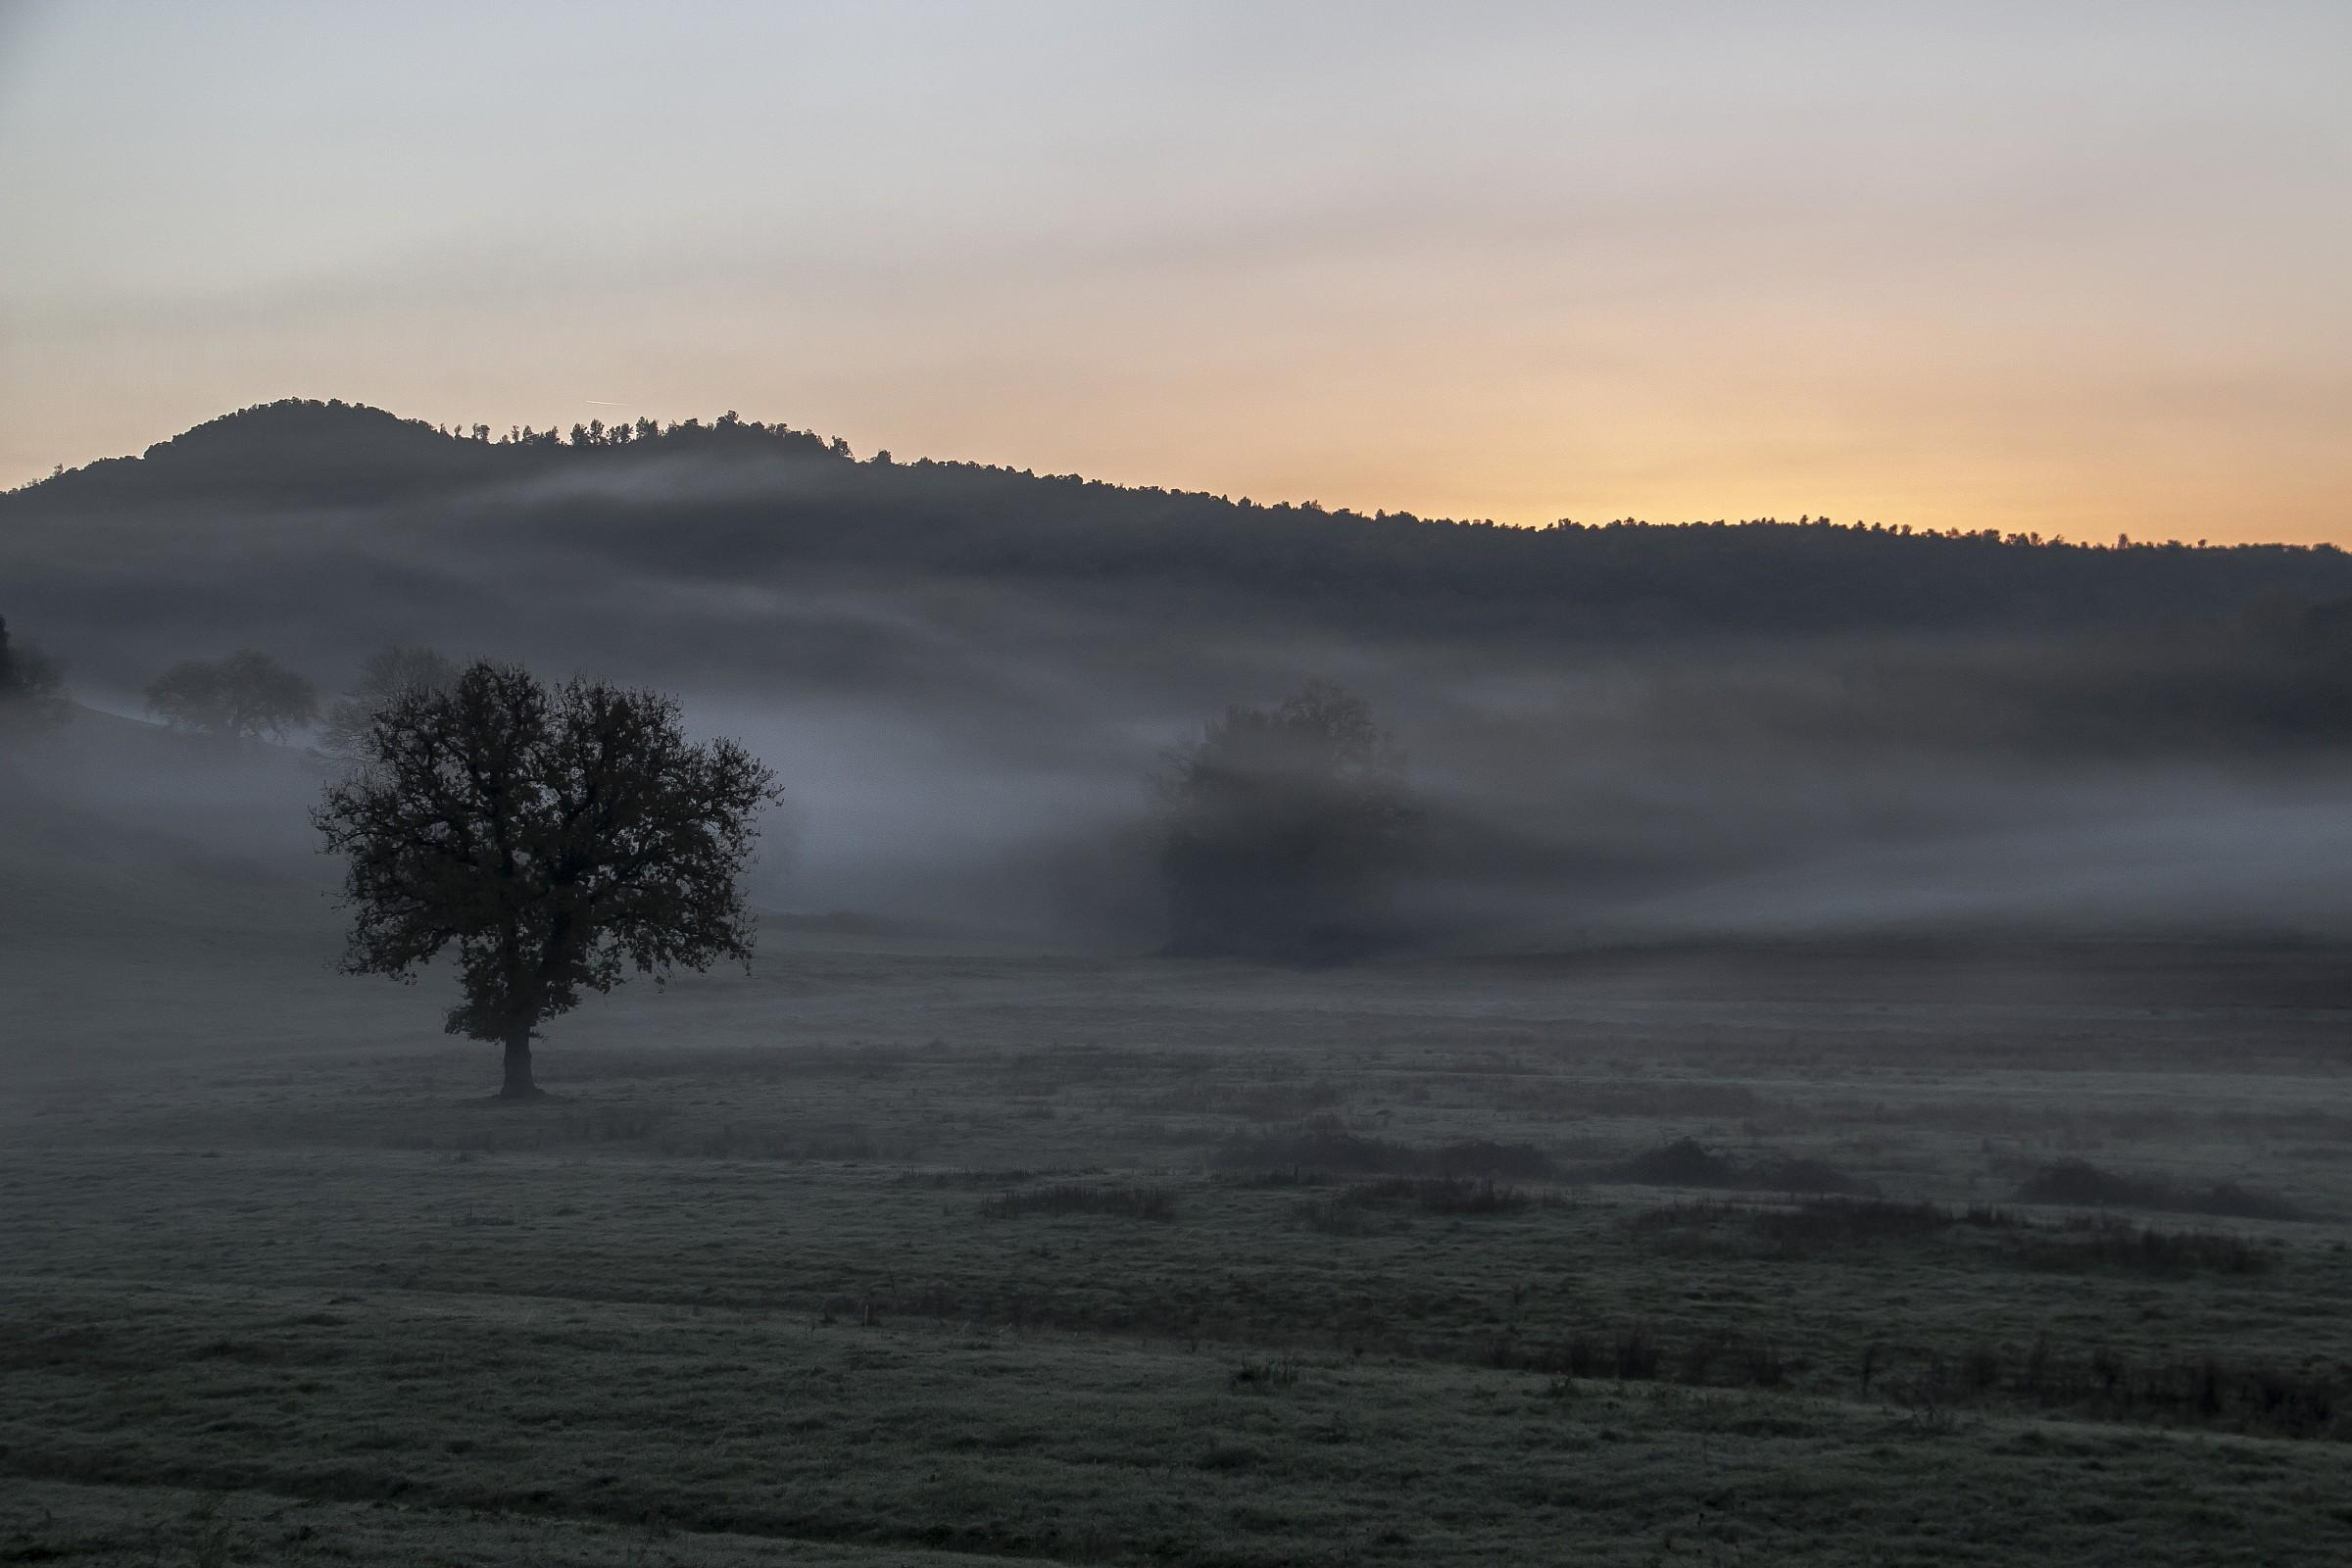 Awakening with fog...